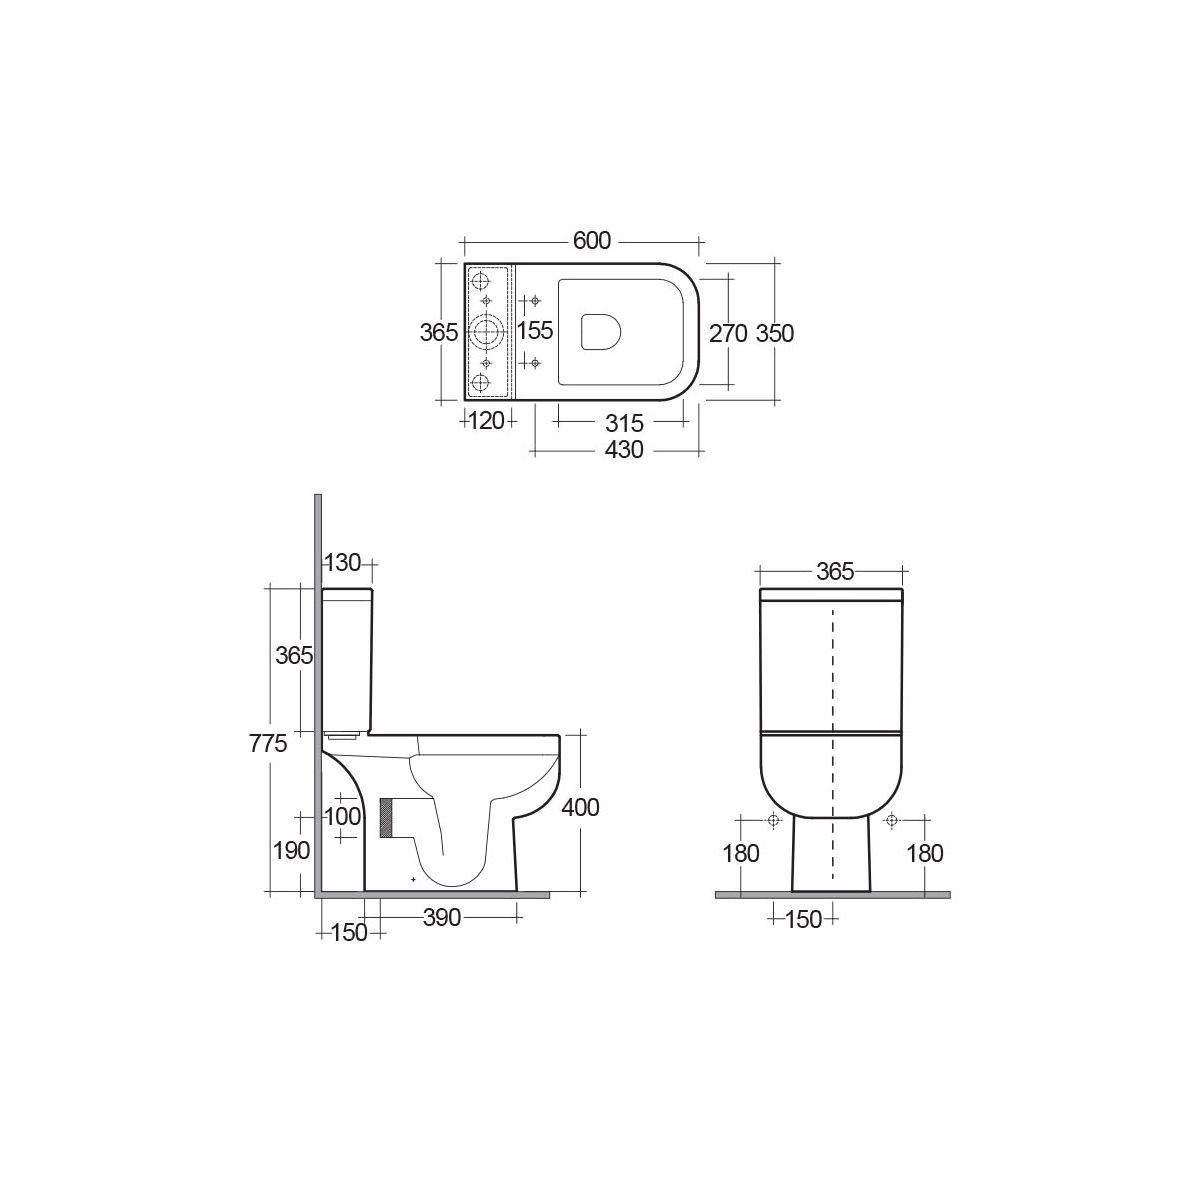 RAK Series 600 Close Coupled Toilet Dimensions